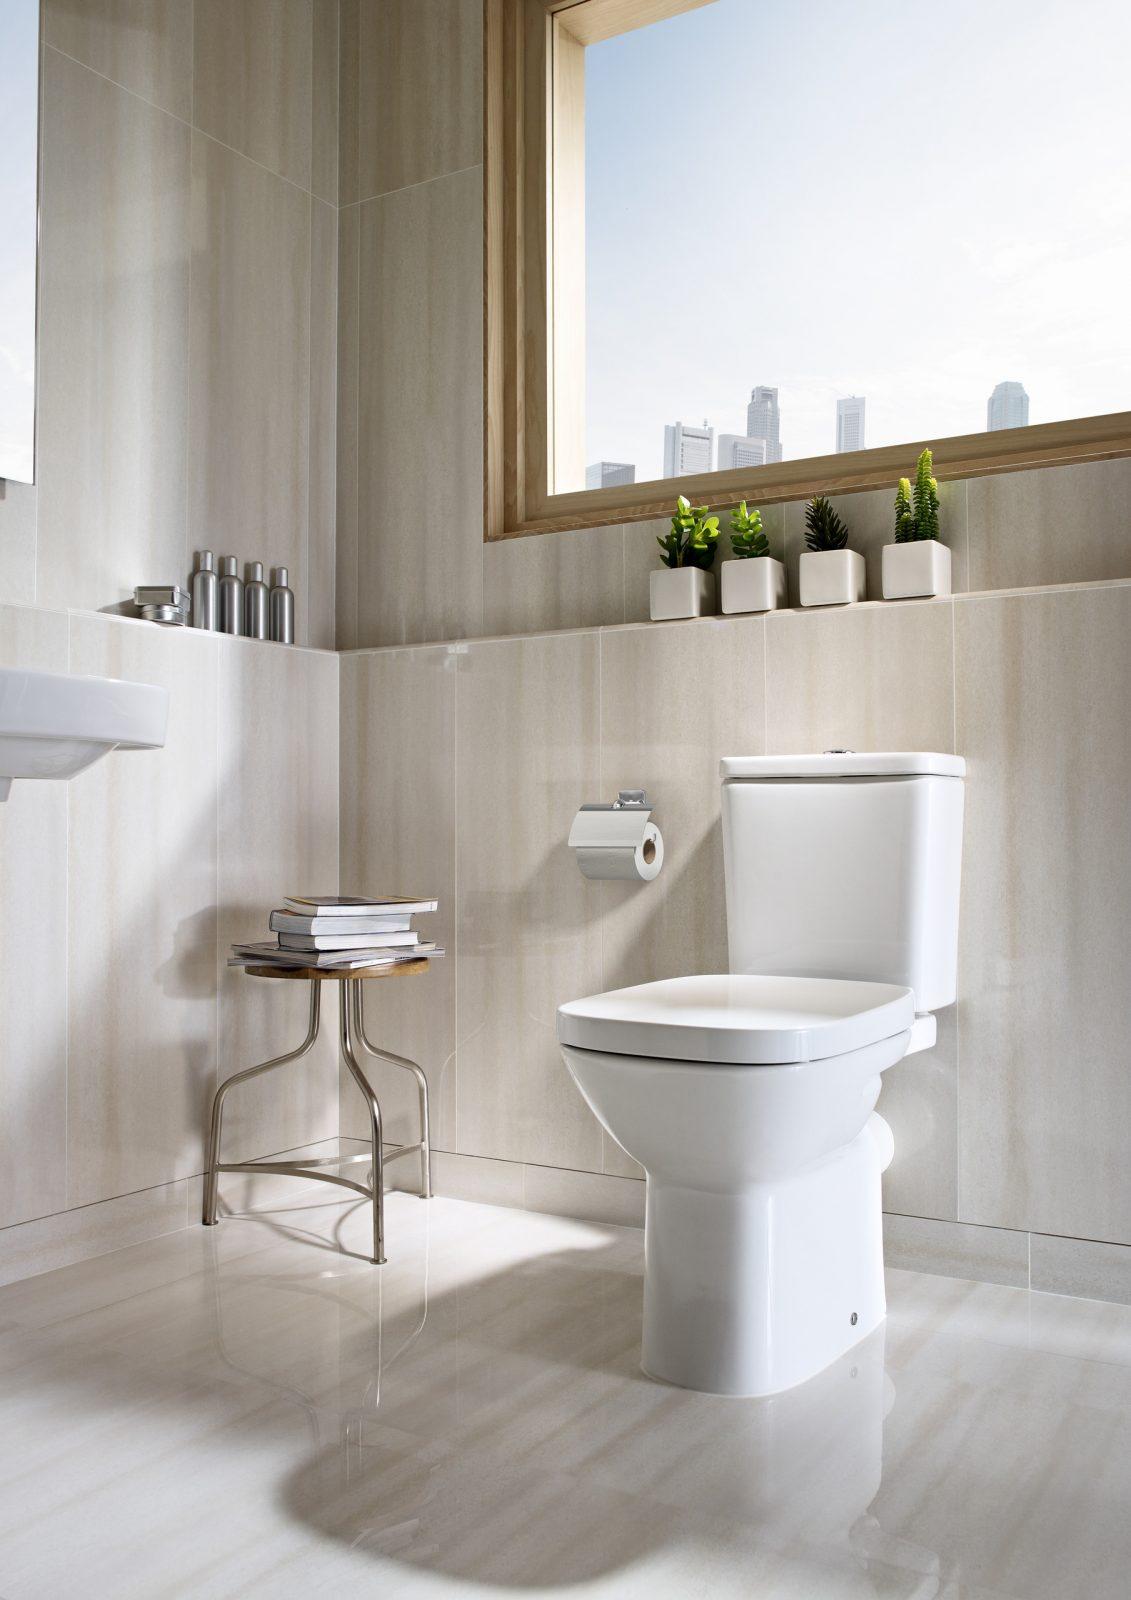 wc sur pied debba de roca salle de bains. Black Bedroom Furniture Sets. Home Design Ideas